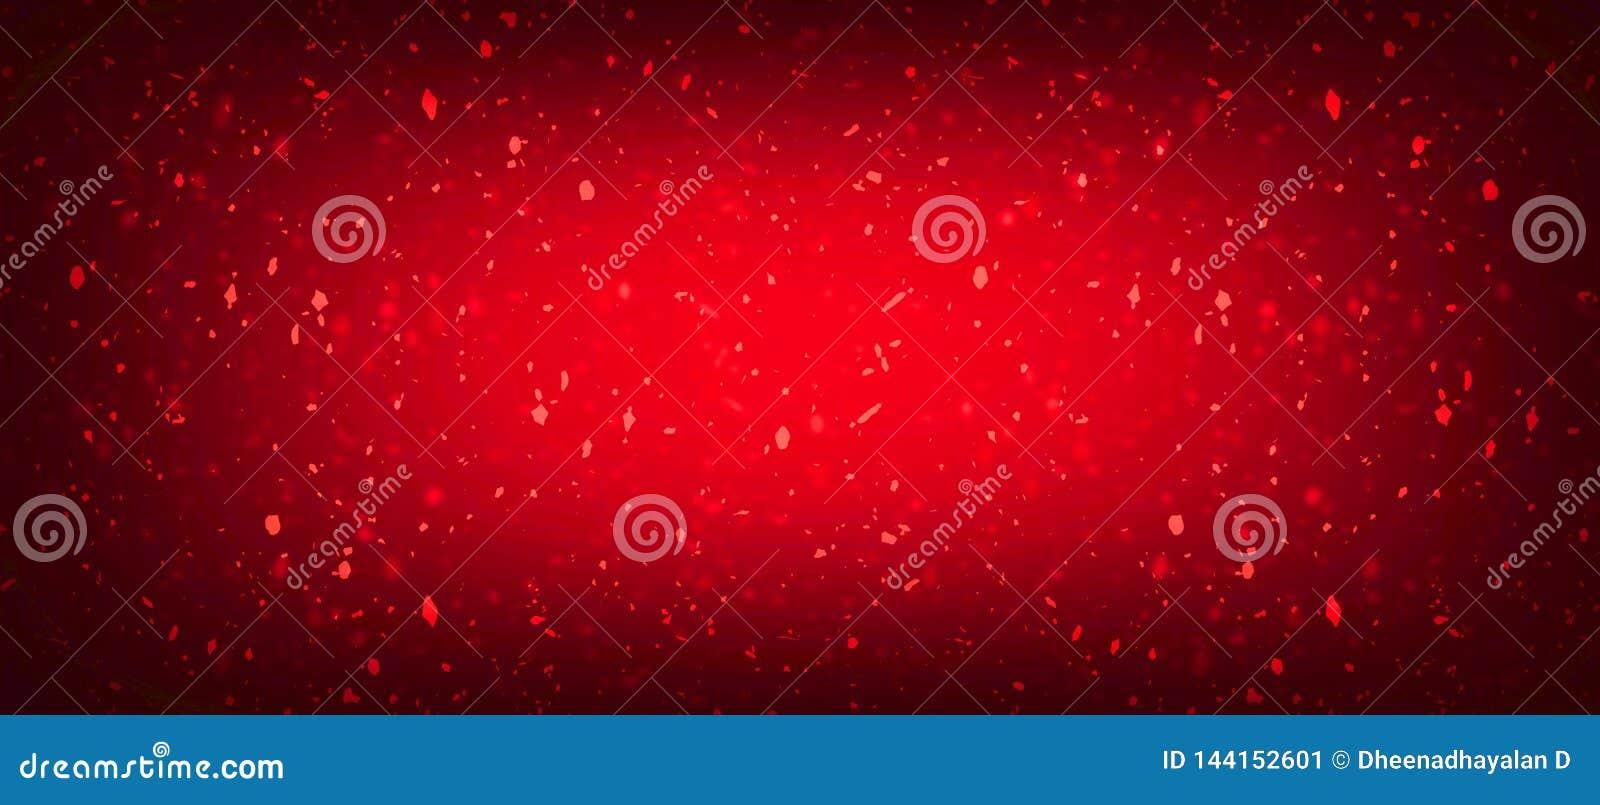 Красная абстрактная предпосылка или стена года сбора винограда текстуры красная треснутая Красивая предпосылка Grunge